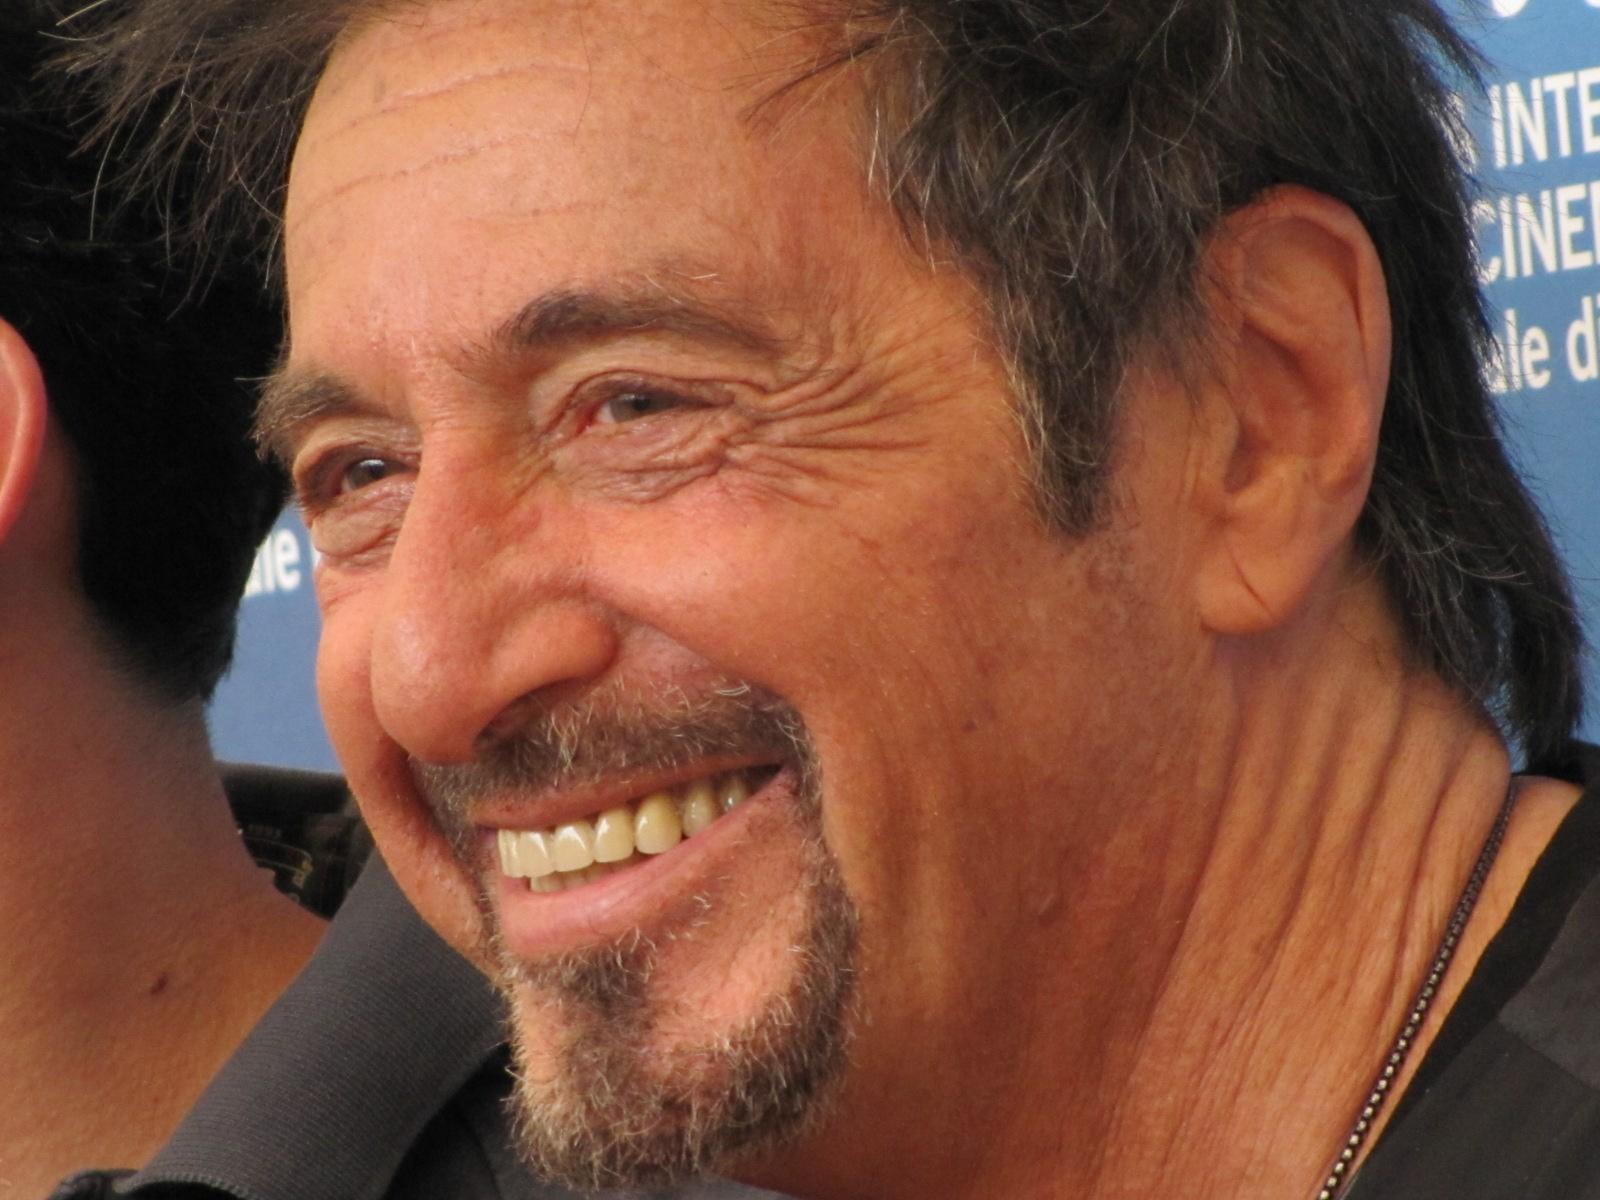 Al Pacino a Venezia 71 con due film: Manglehorn e The Humbling